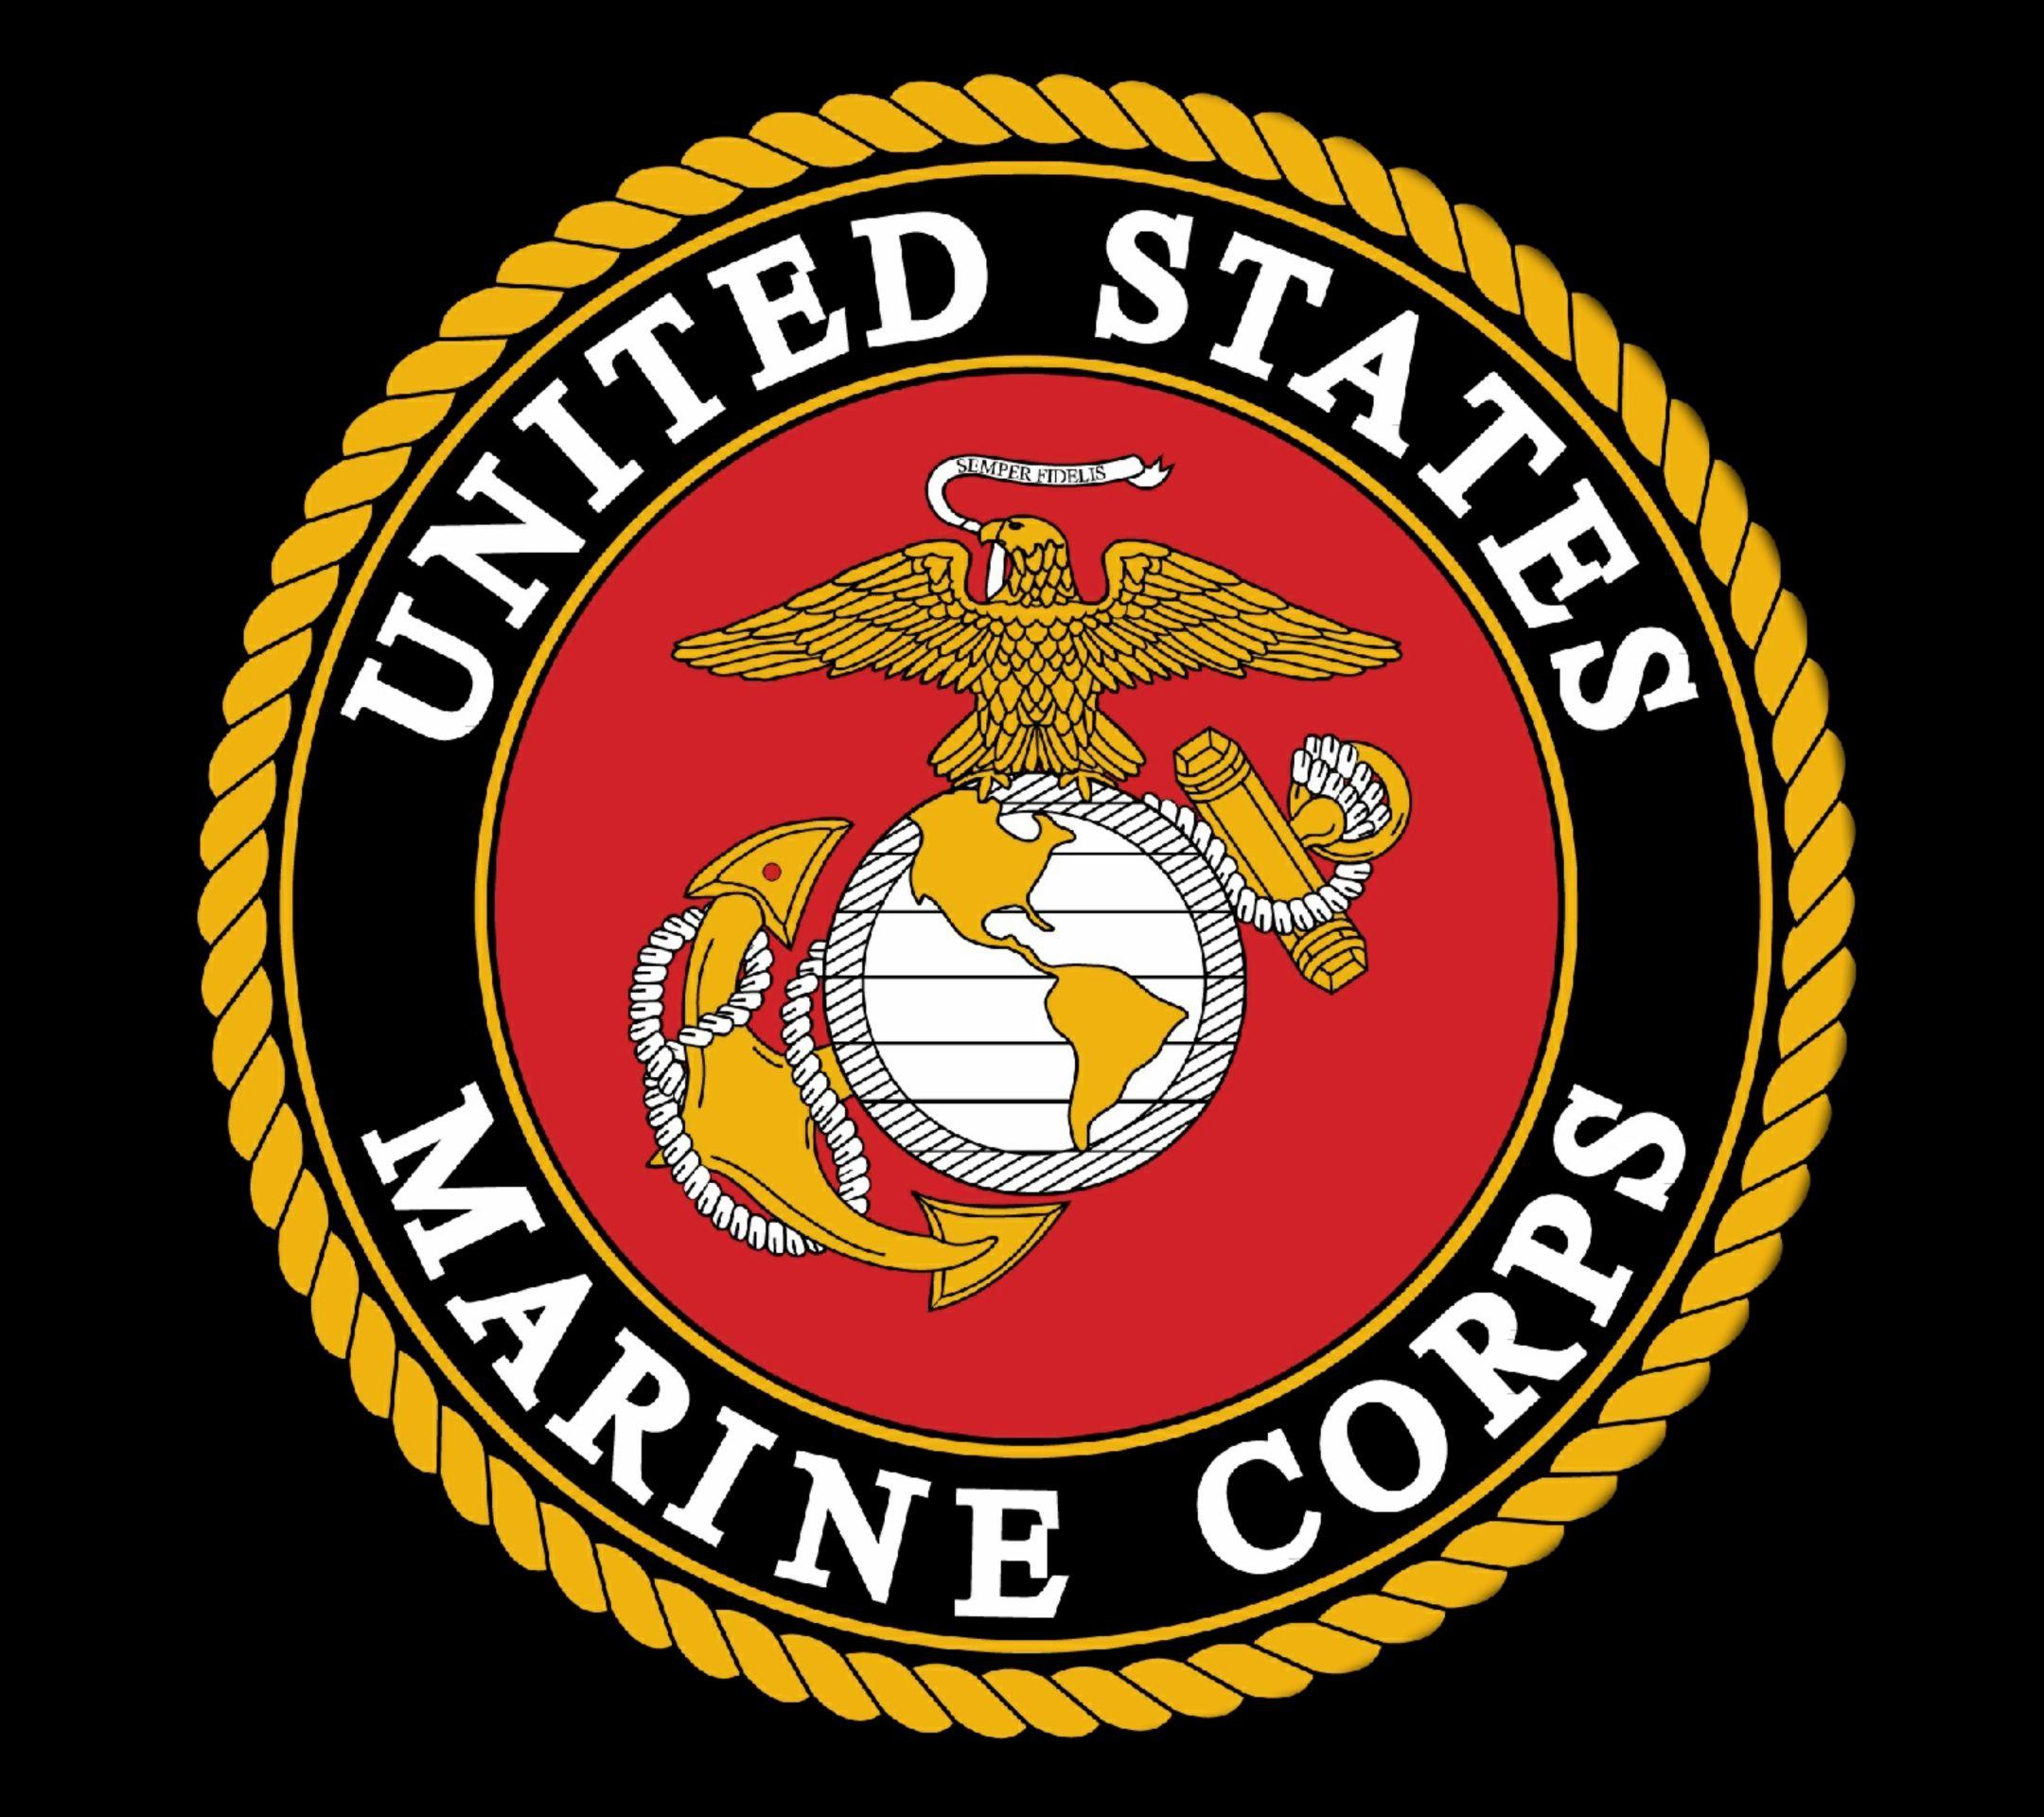 2160x1920 Marine Corps Emblem Download Gallery